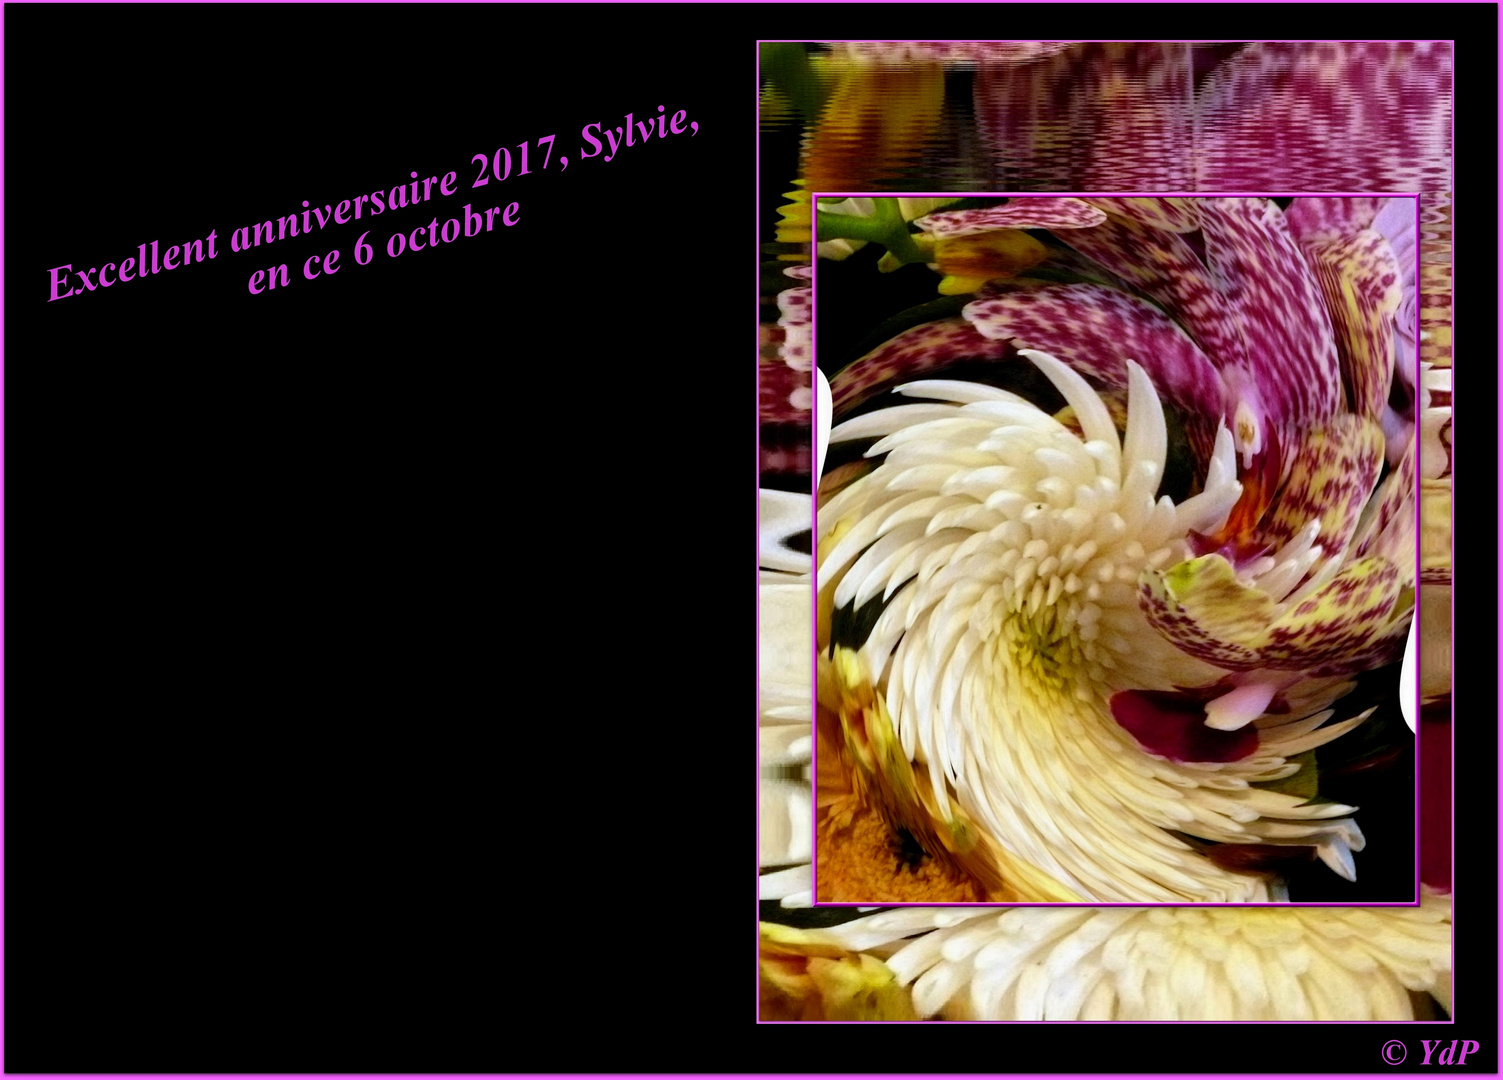 Excellent anniversaire 2017, Sylvie !...